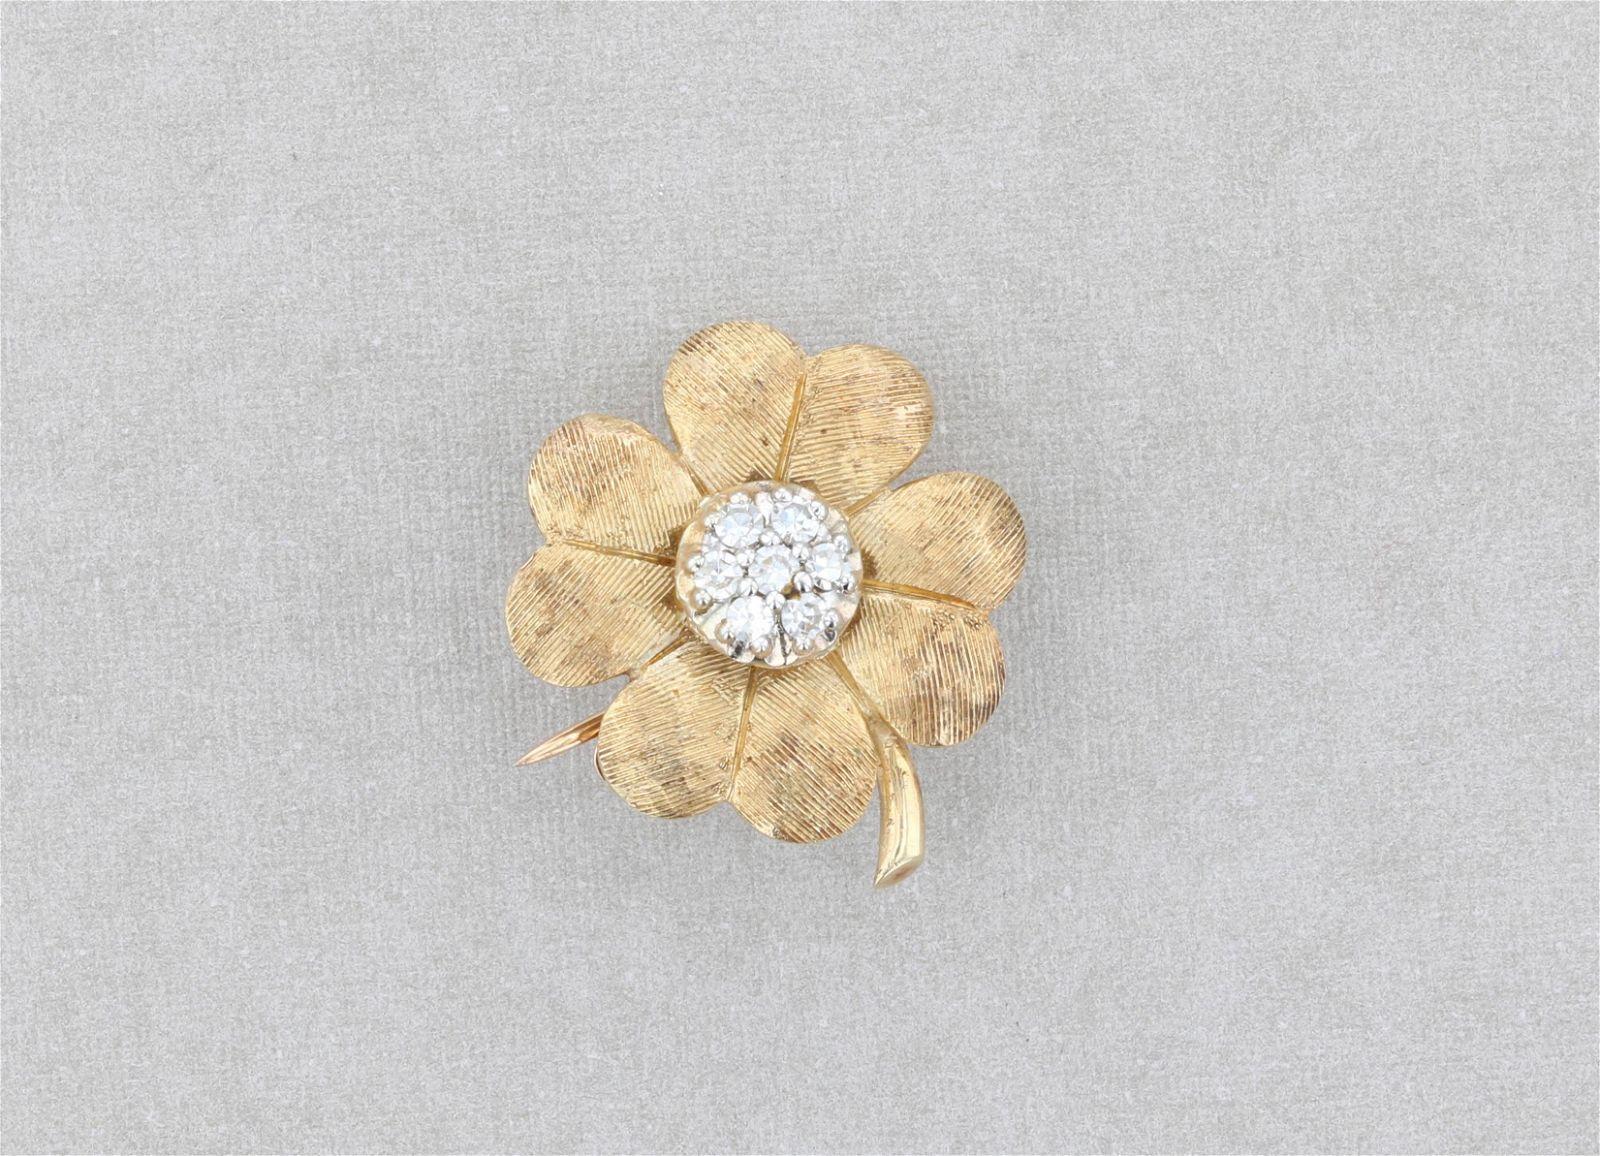 14K Gold and Diamond Four Leaf Clover Brooch